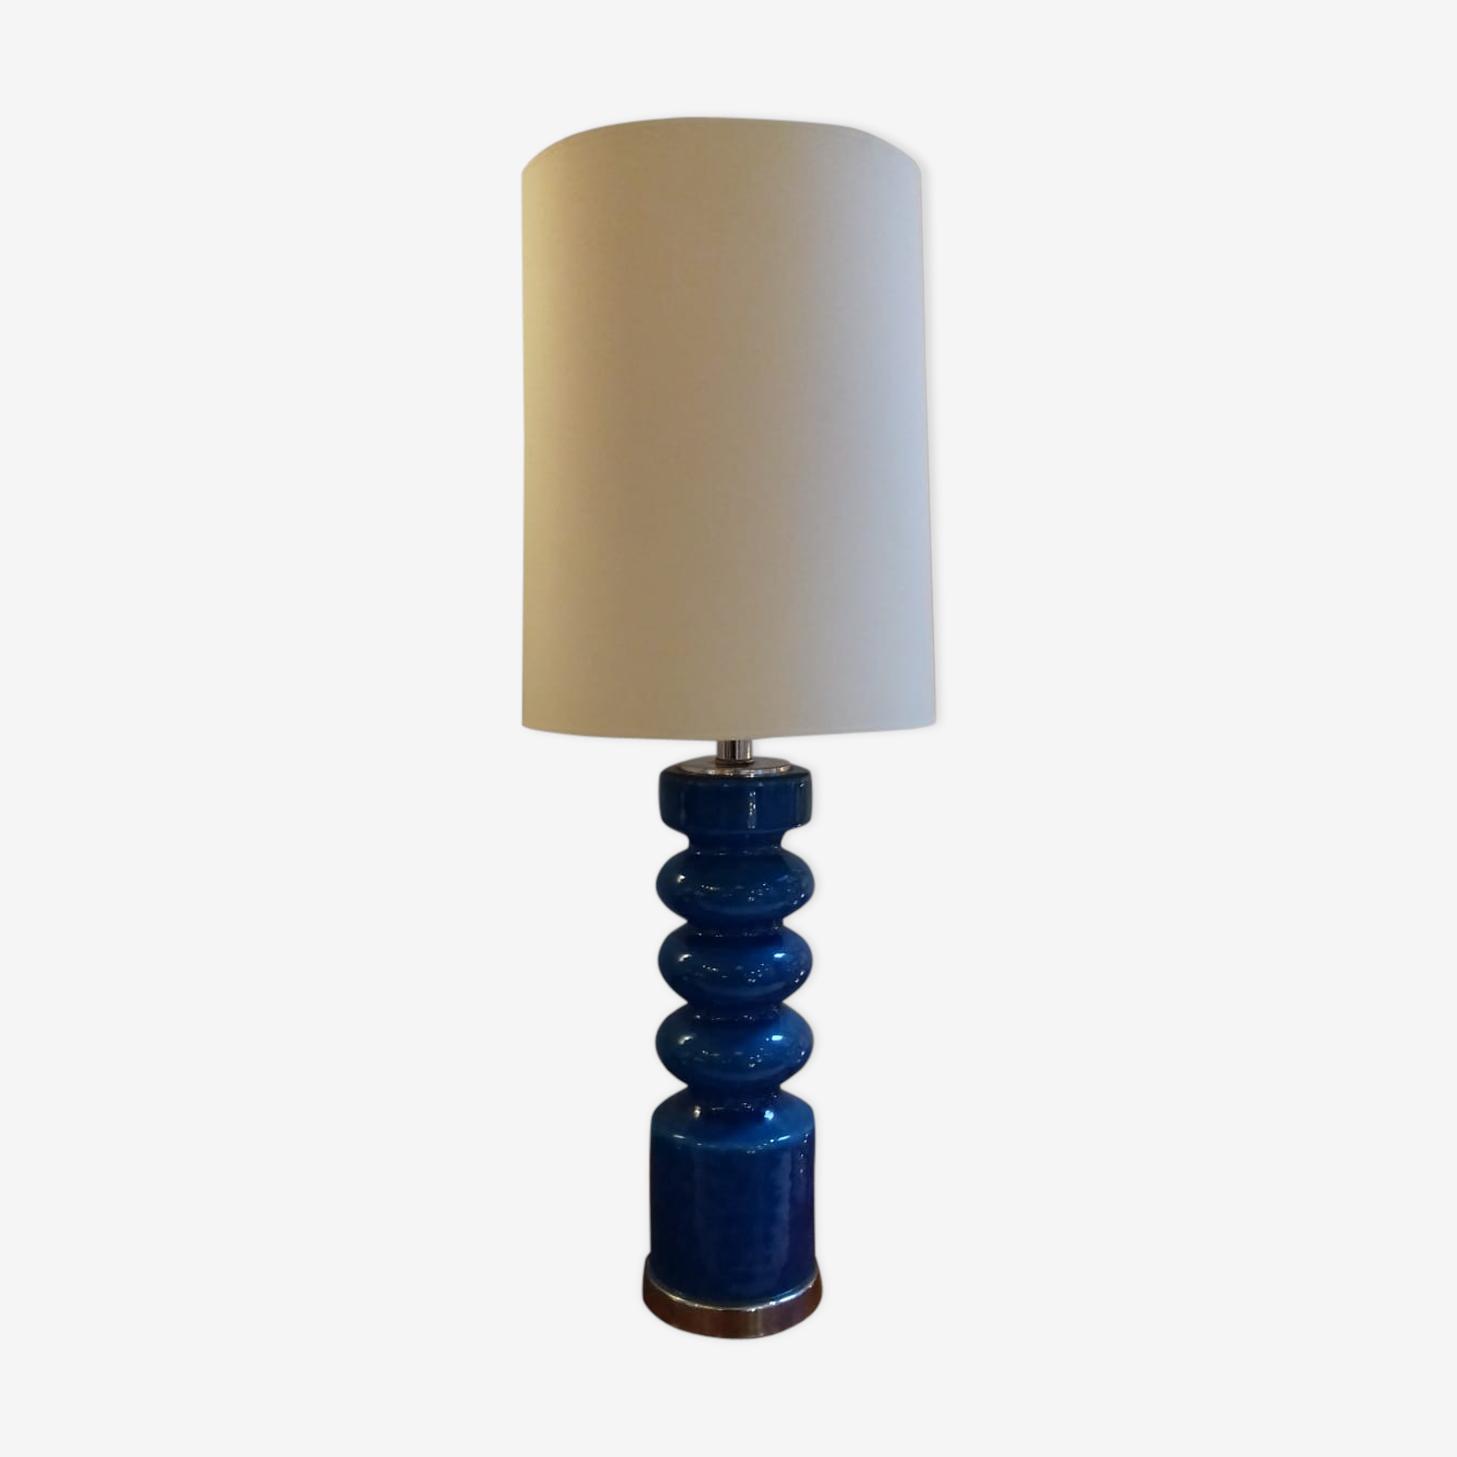 Lampe américaine, 1960's